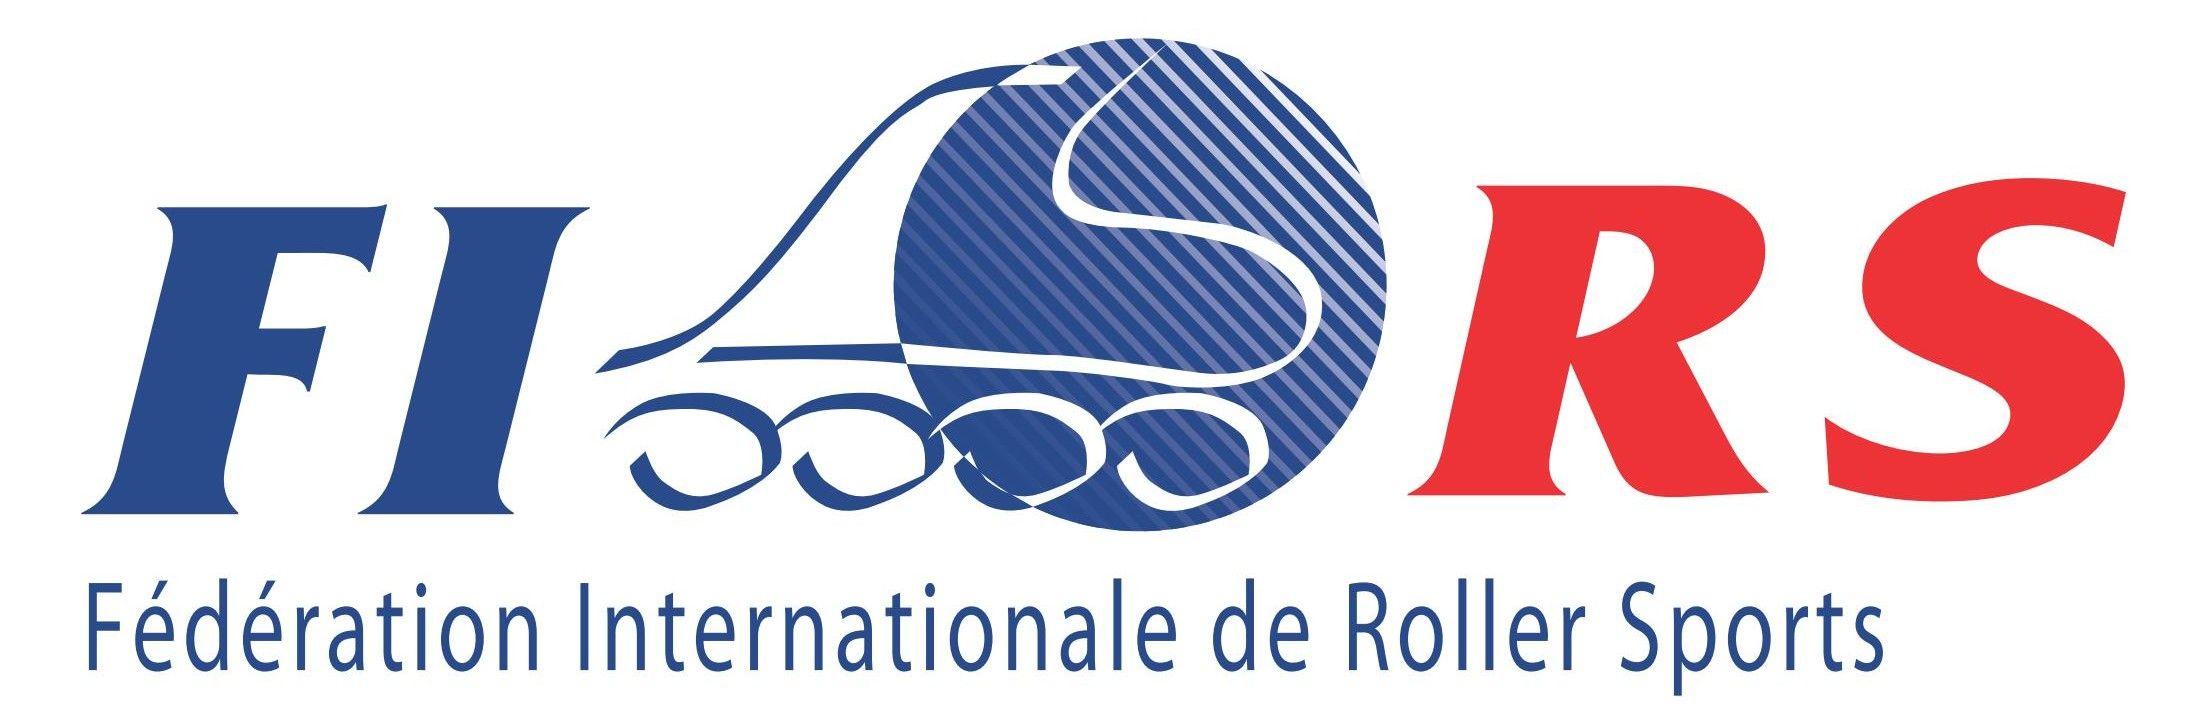 International Roller Sports Federation (FIRS) Logo [EPS